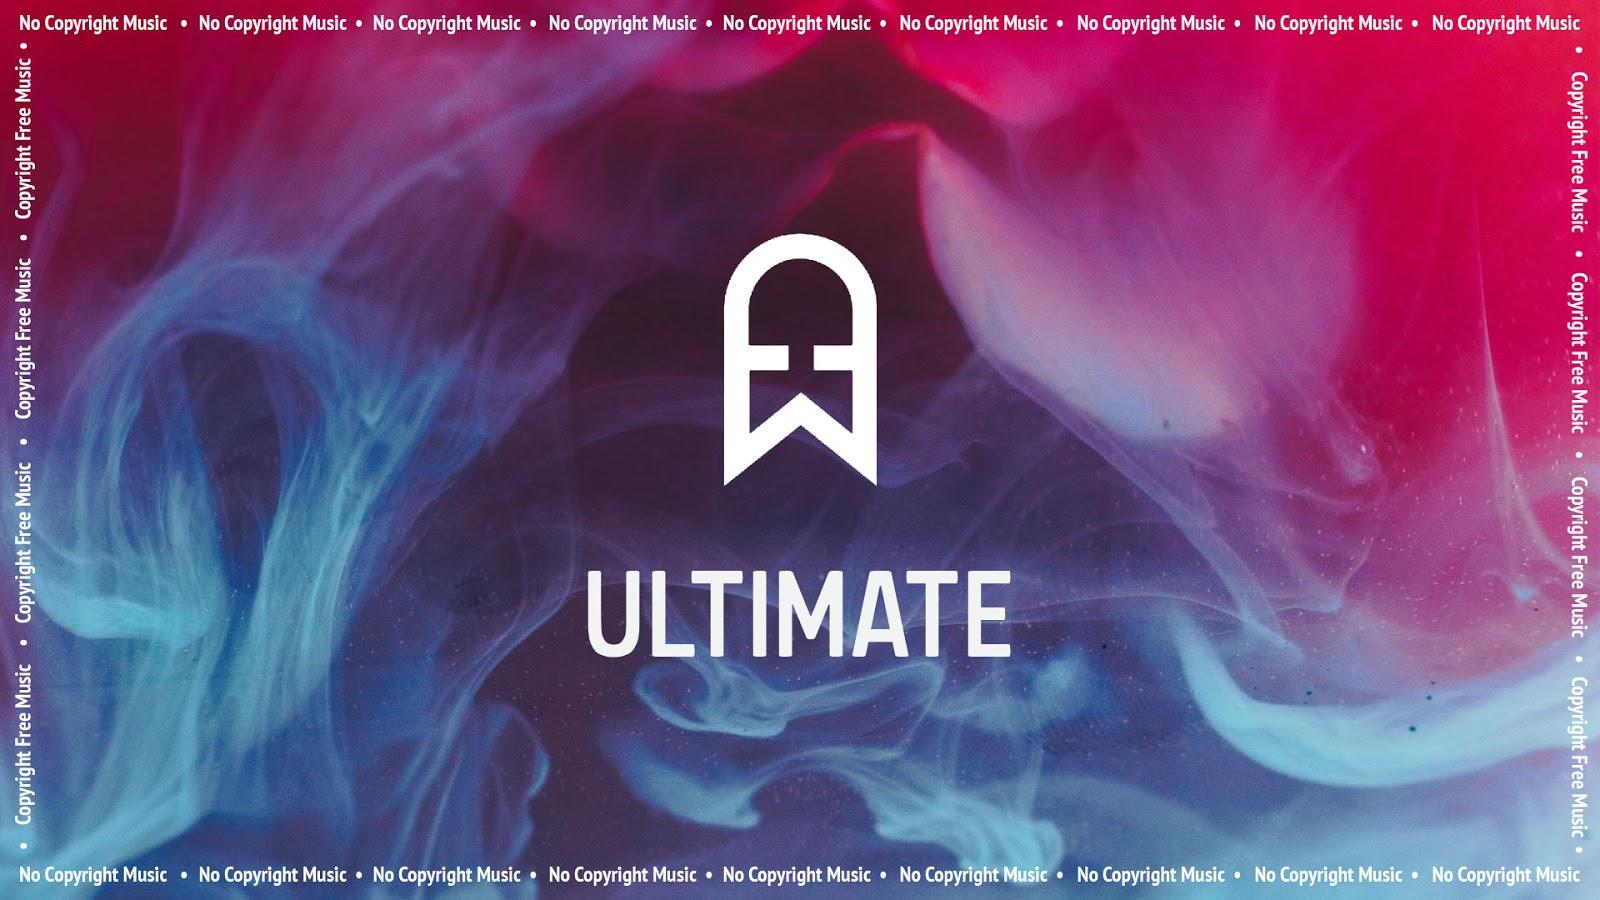 EcroDeron - Ultimate - No Copyright Music - Copyright Free Music - Vlog Music